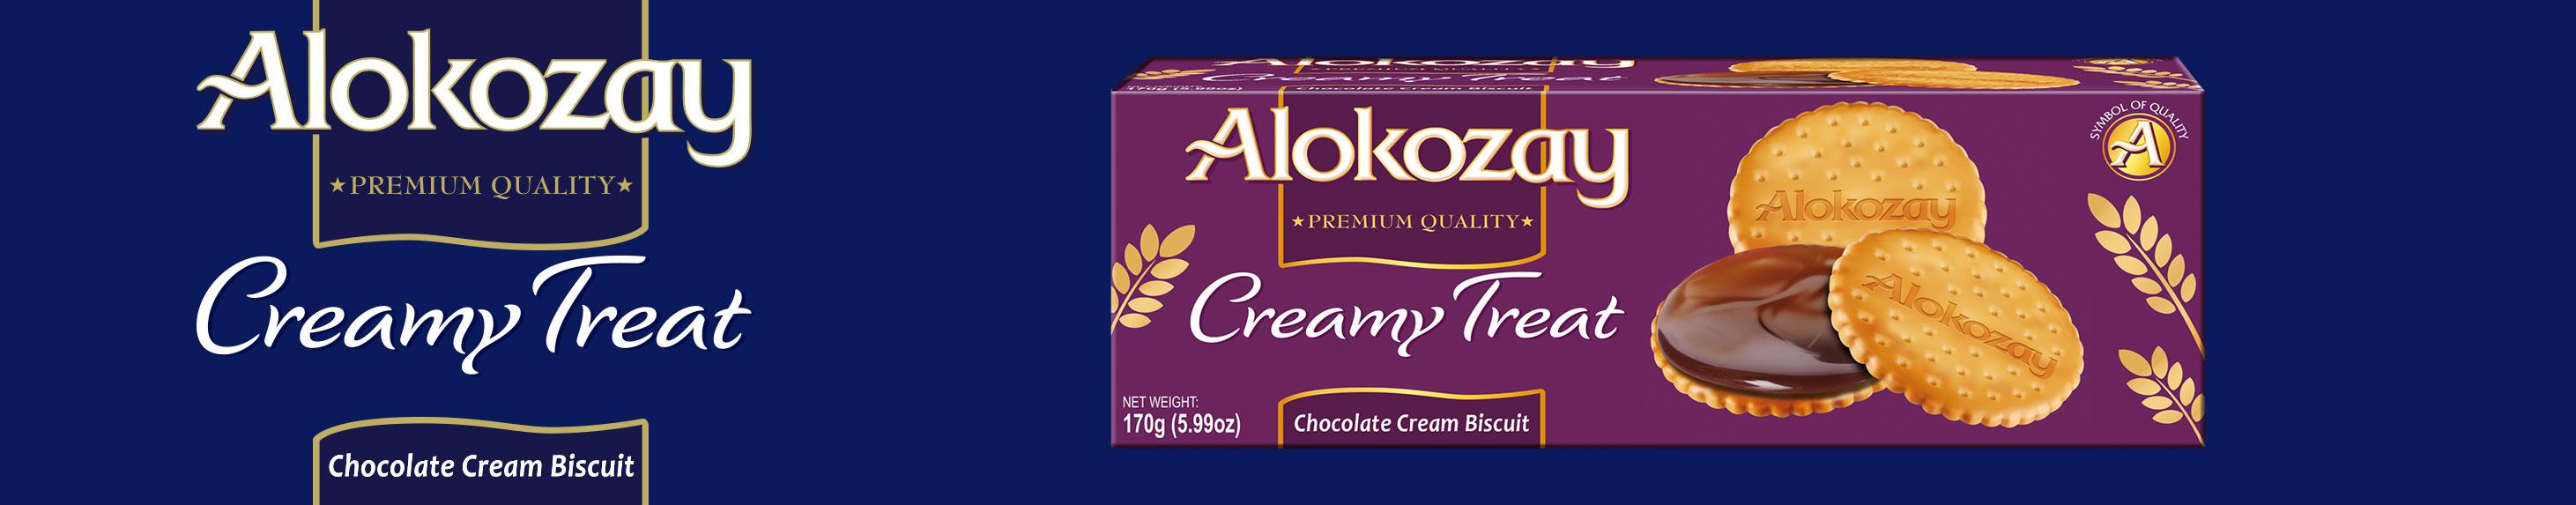 Creamy Treat